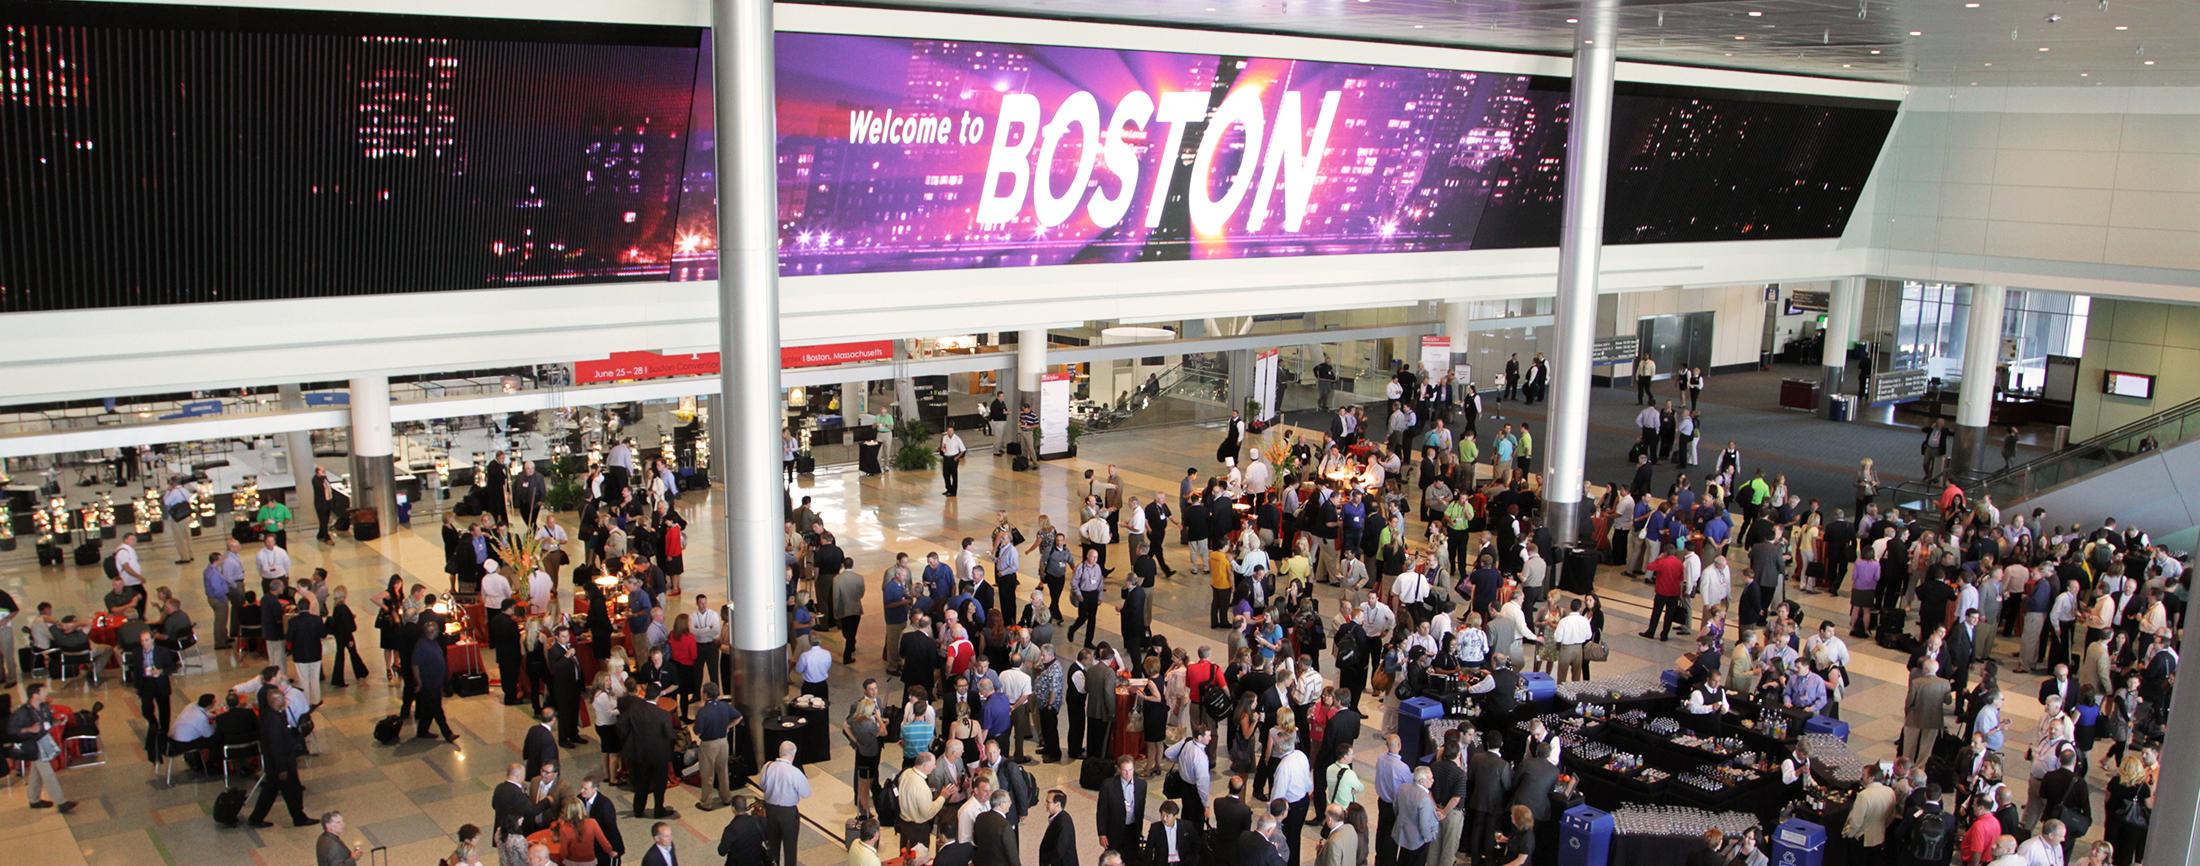 boston convention and exhibition center, bcec